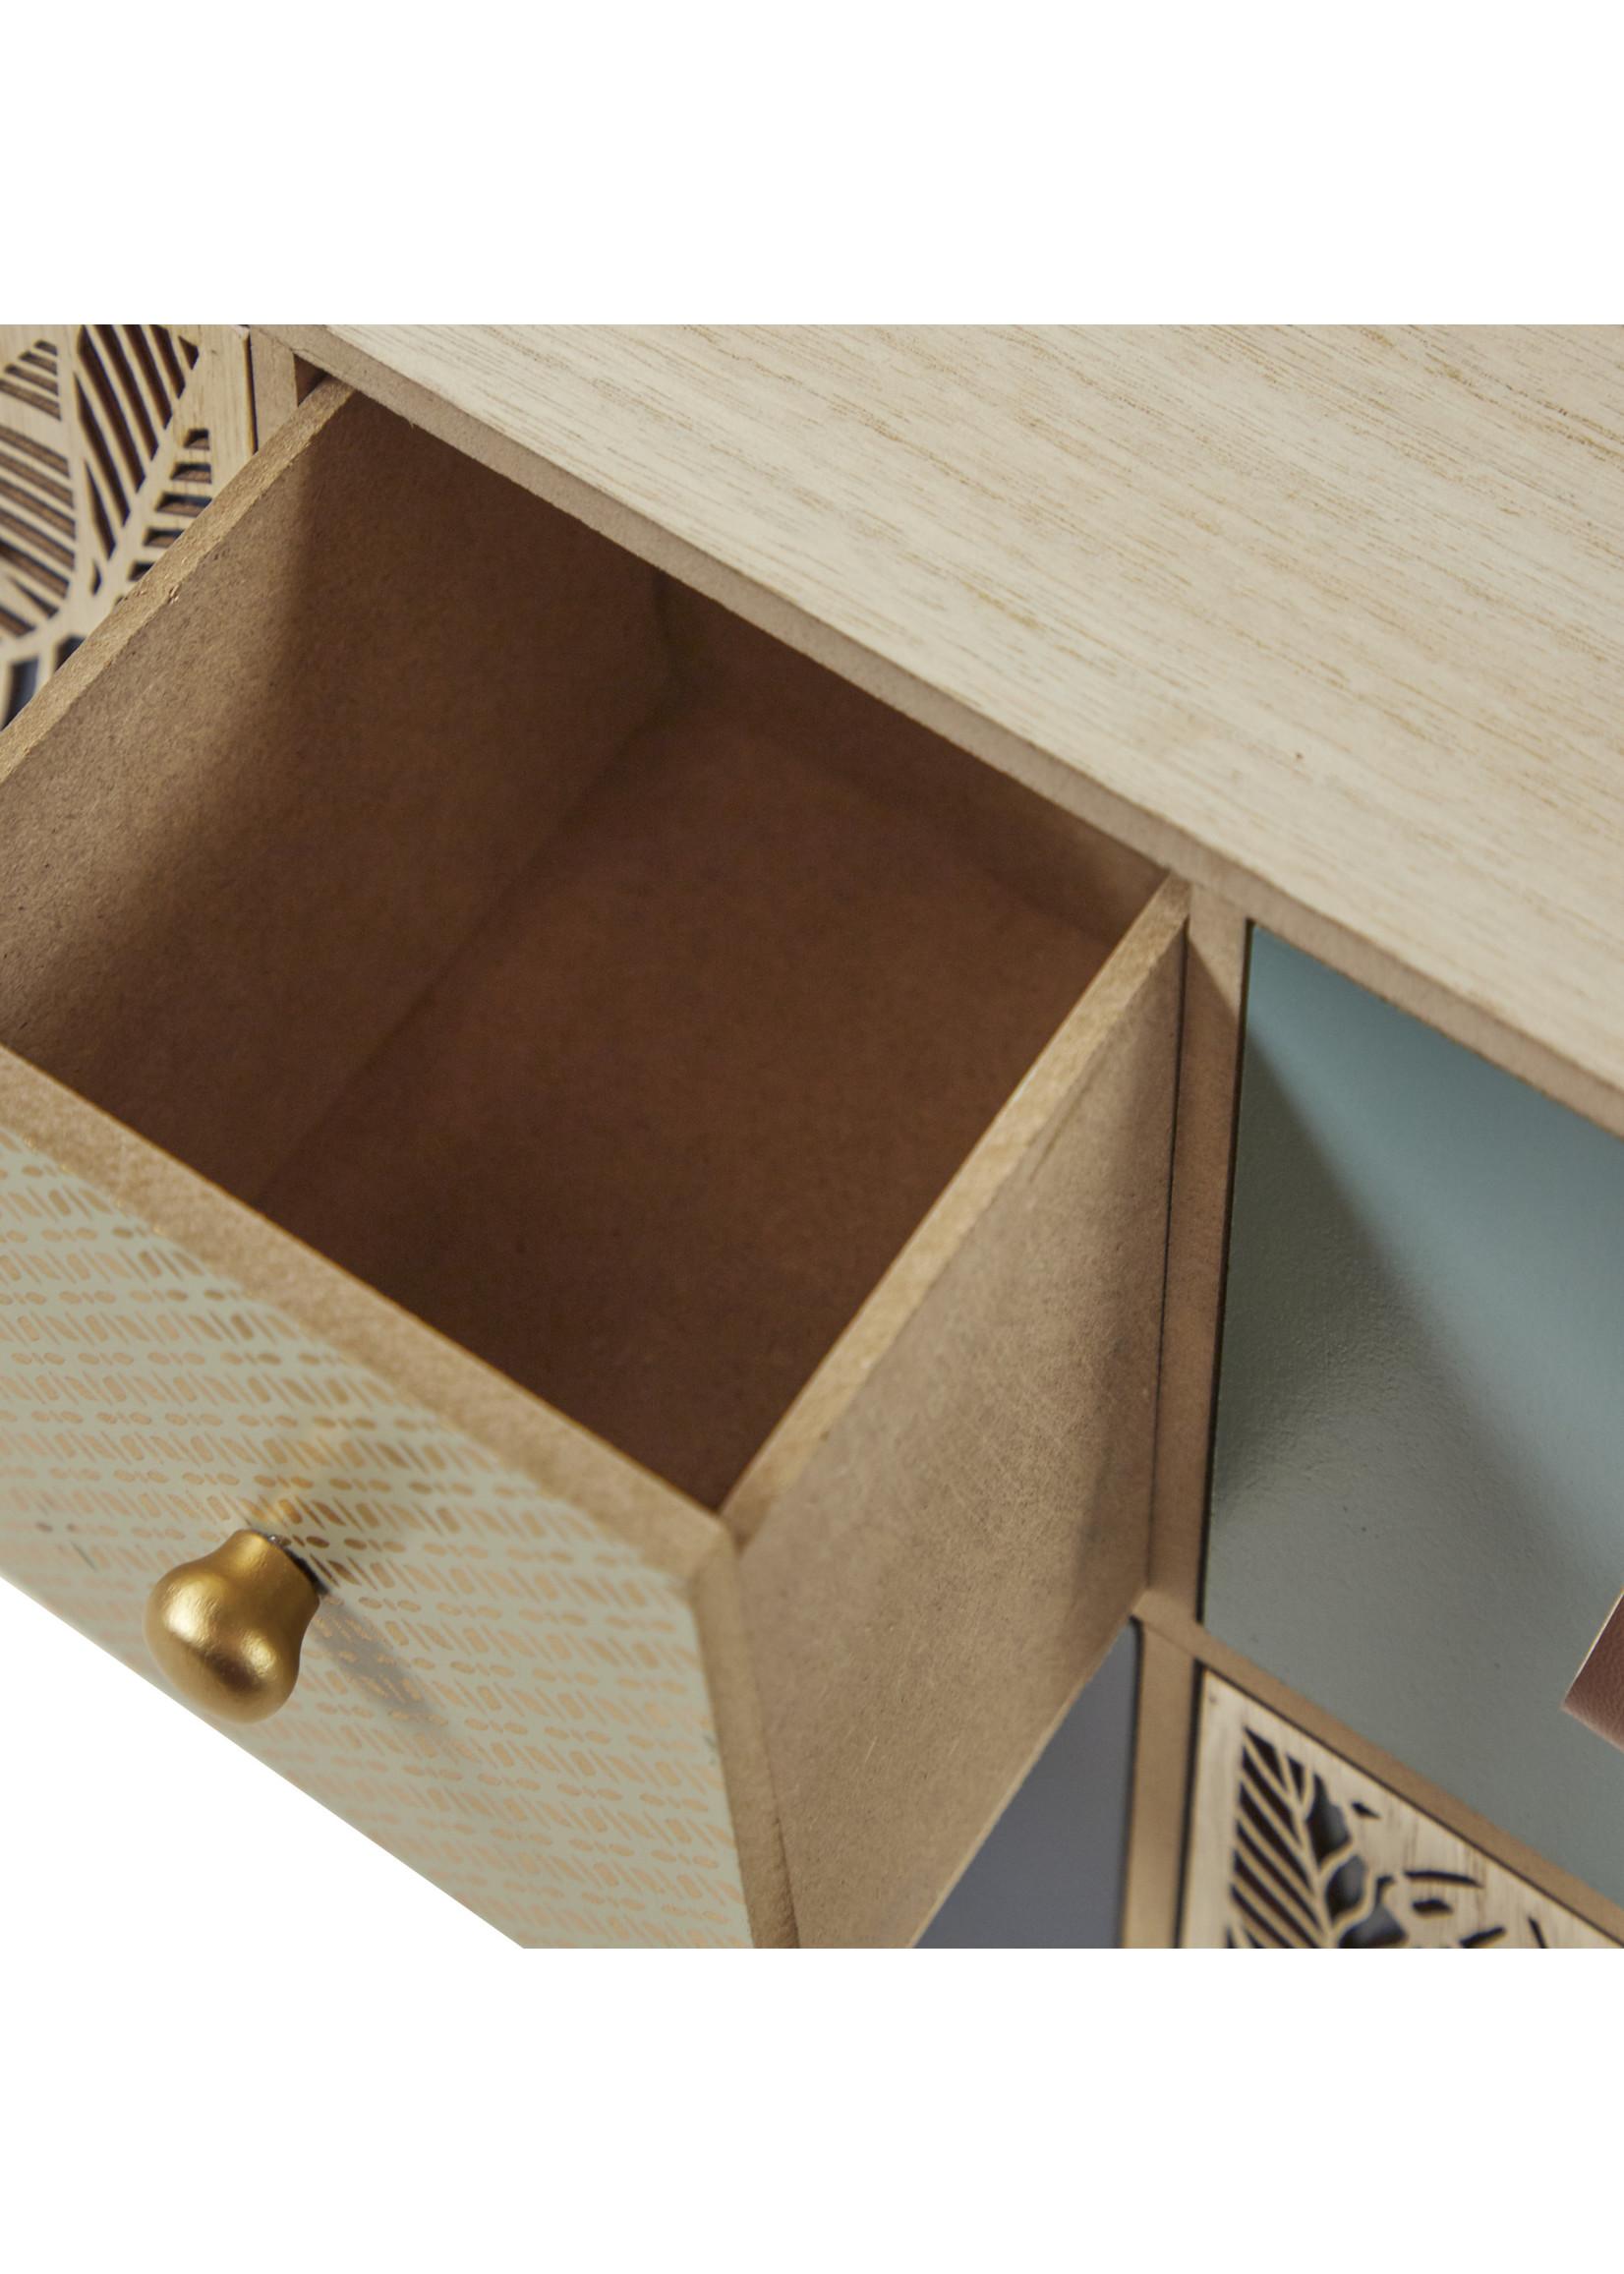 UMA Enterprises Jewellery Box  Teal & Black